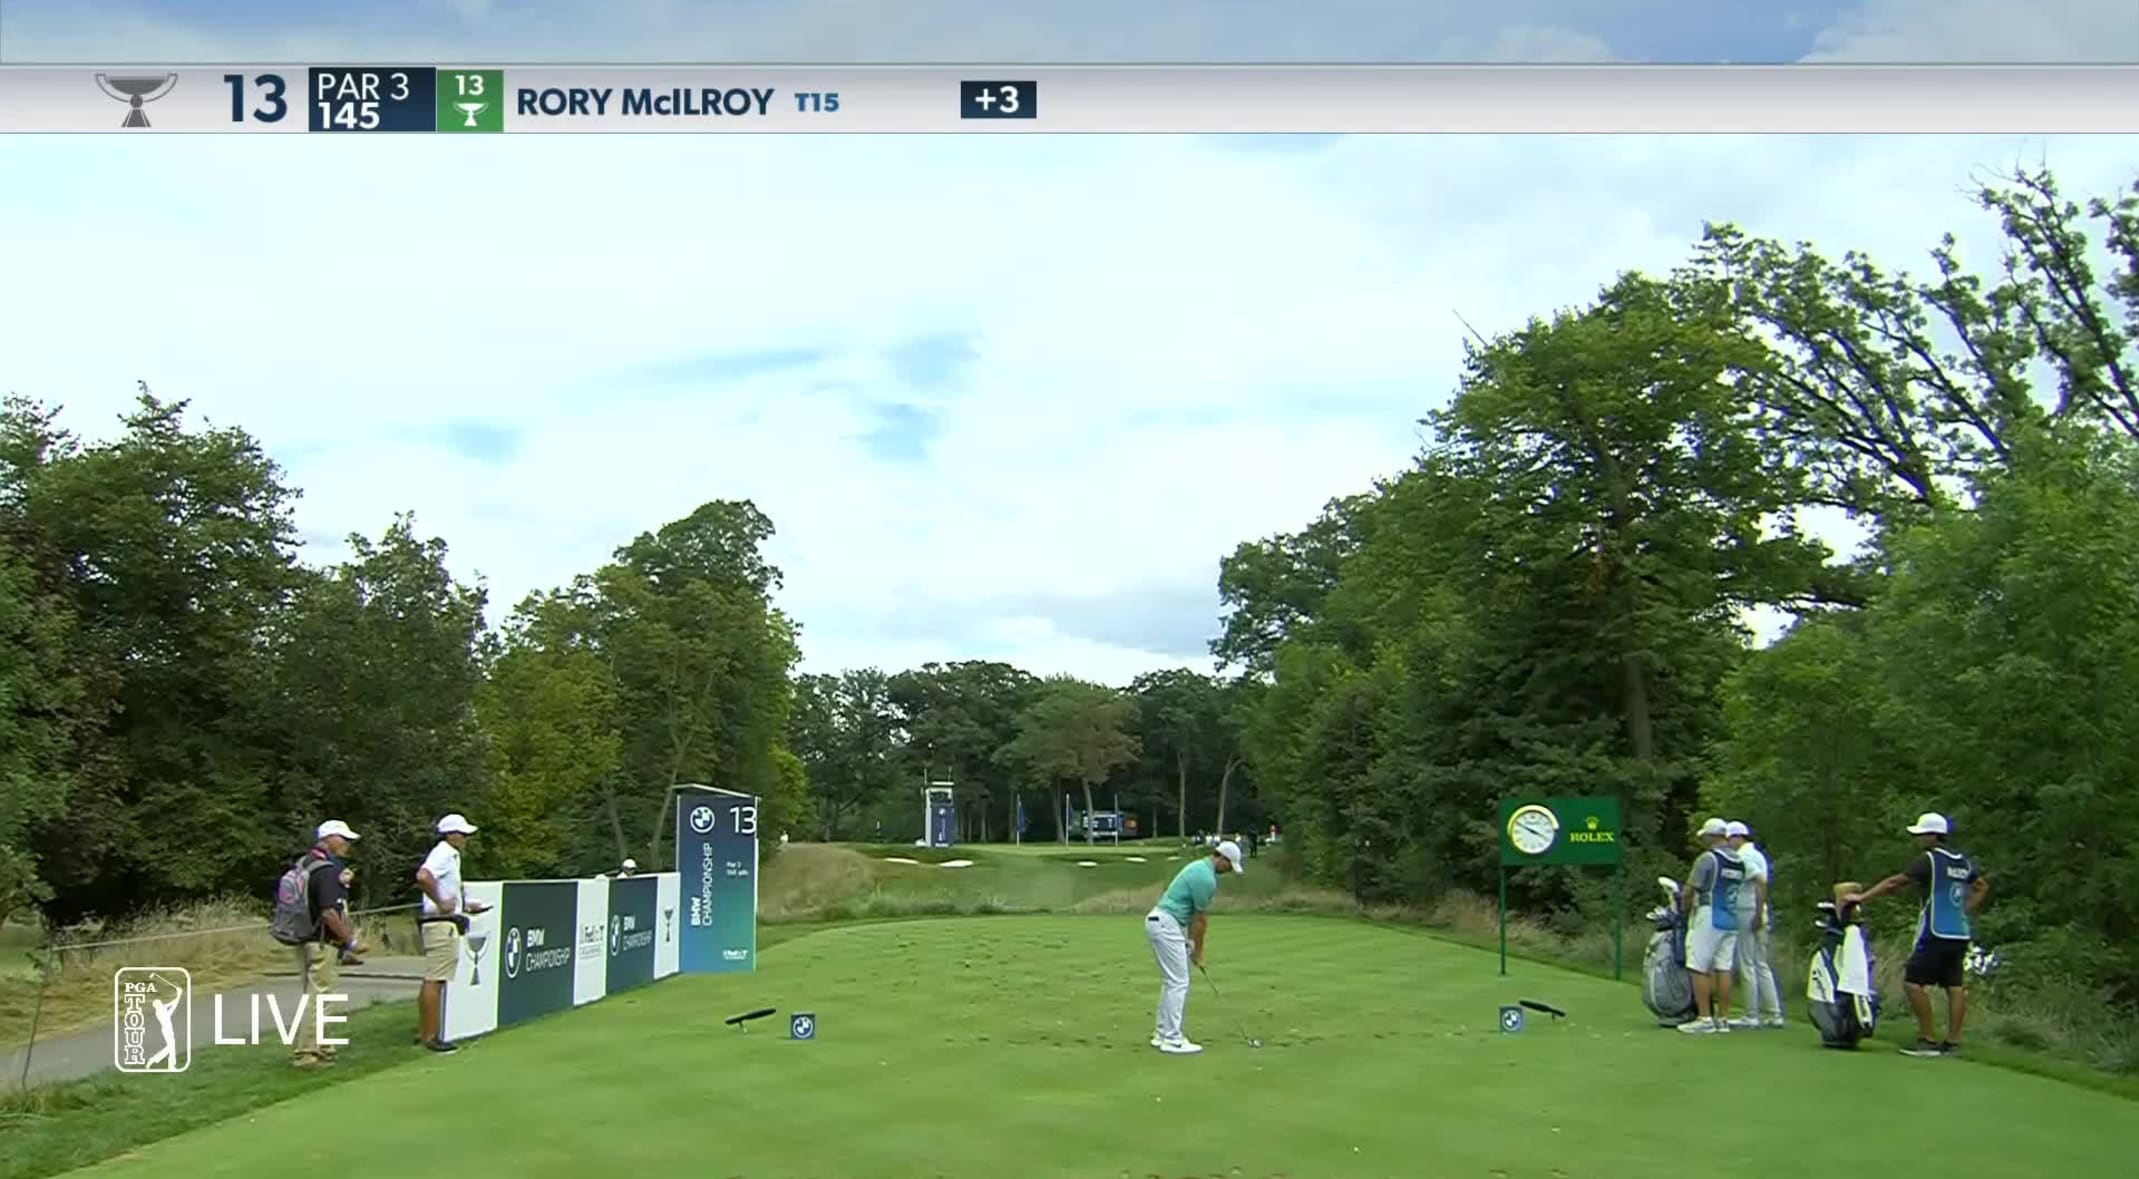 Rory Mcilroy Round 4 Recap At 2020 Bmw Championship Pga Tour